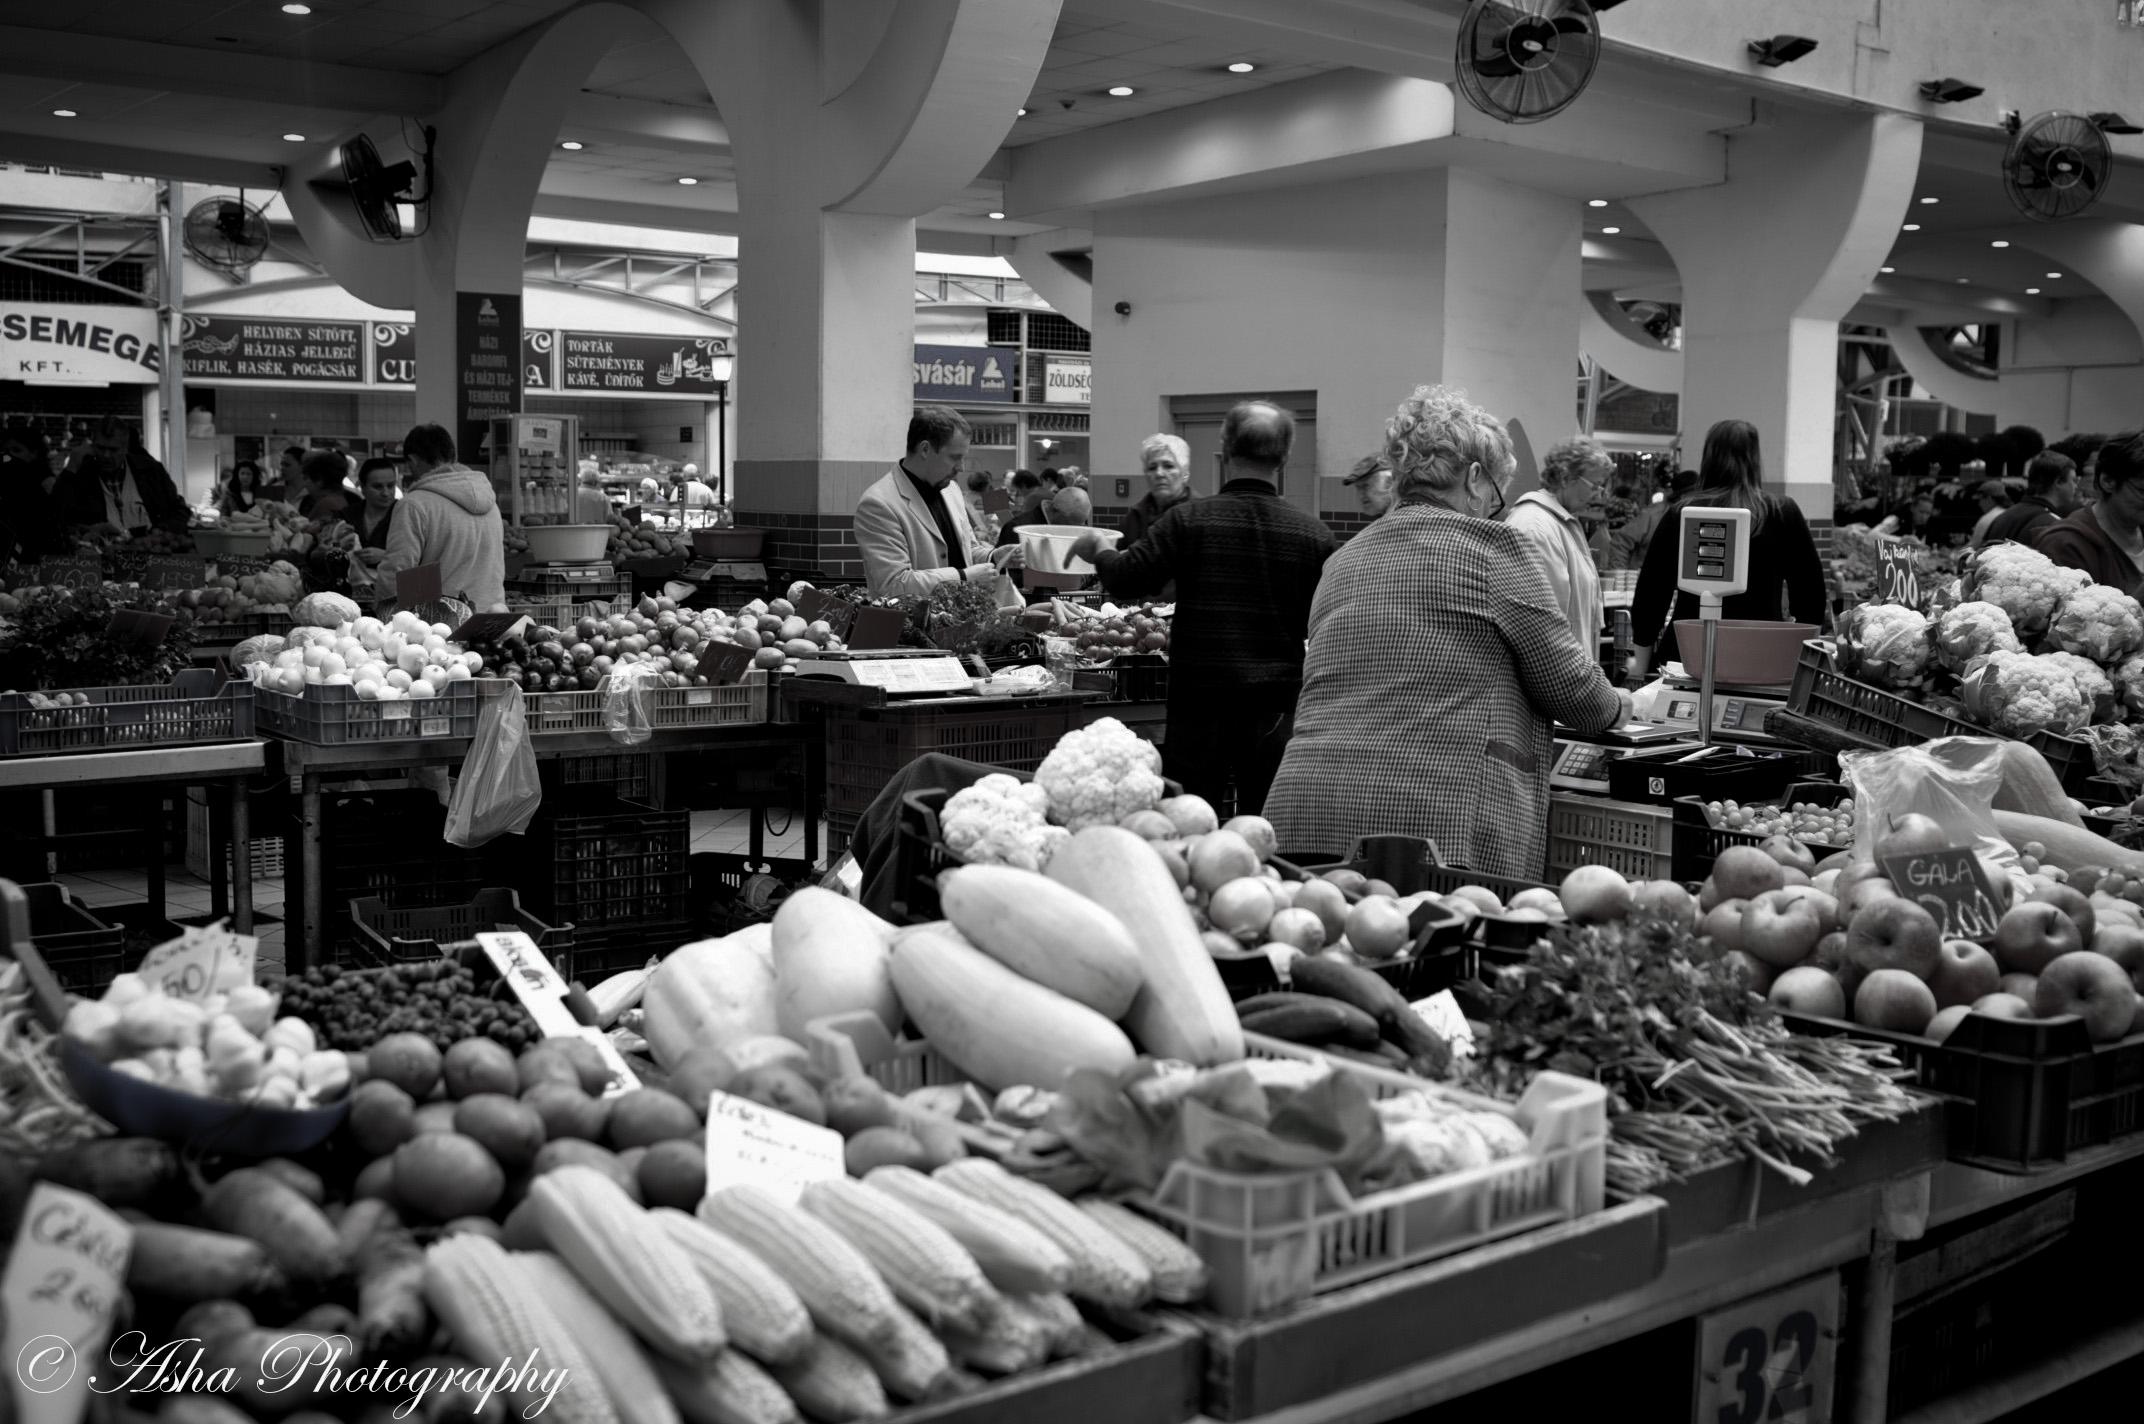 Budapest - Market